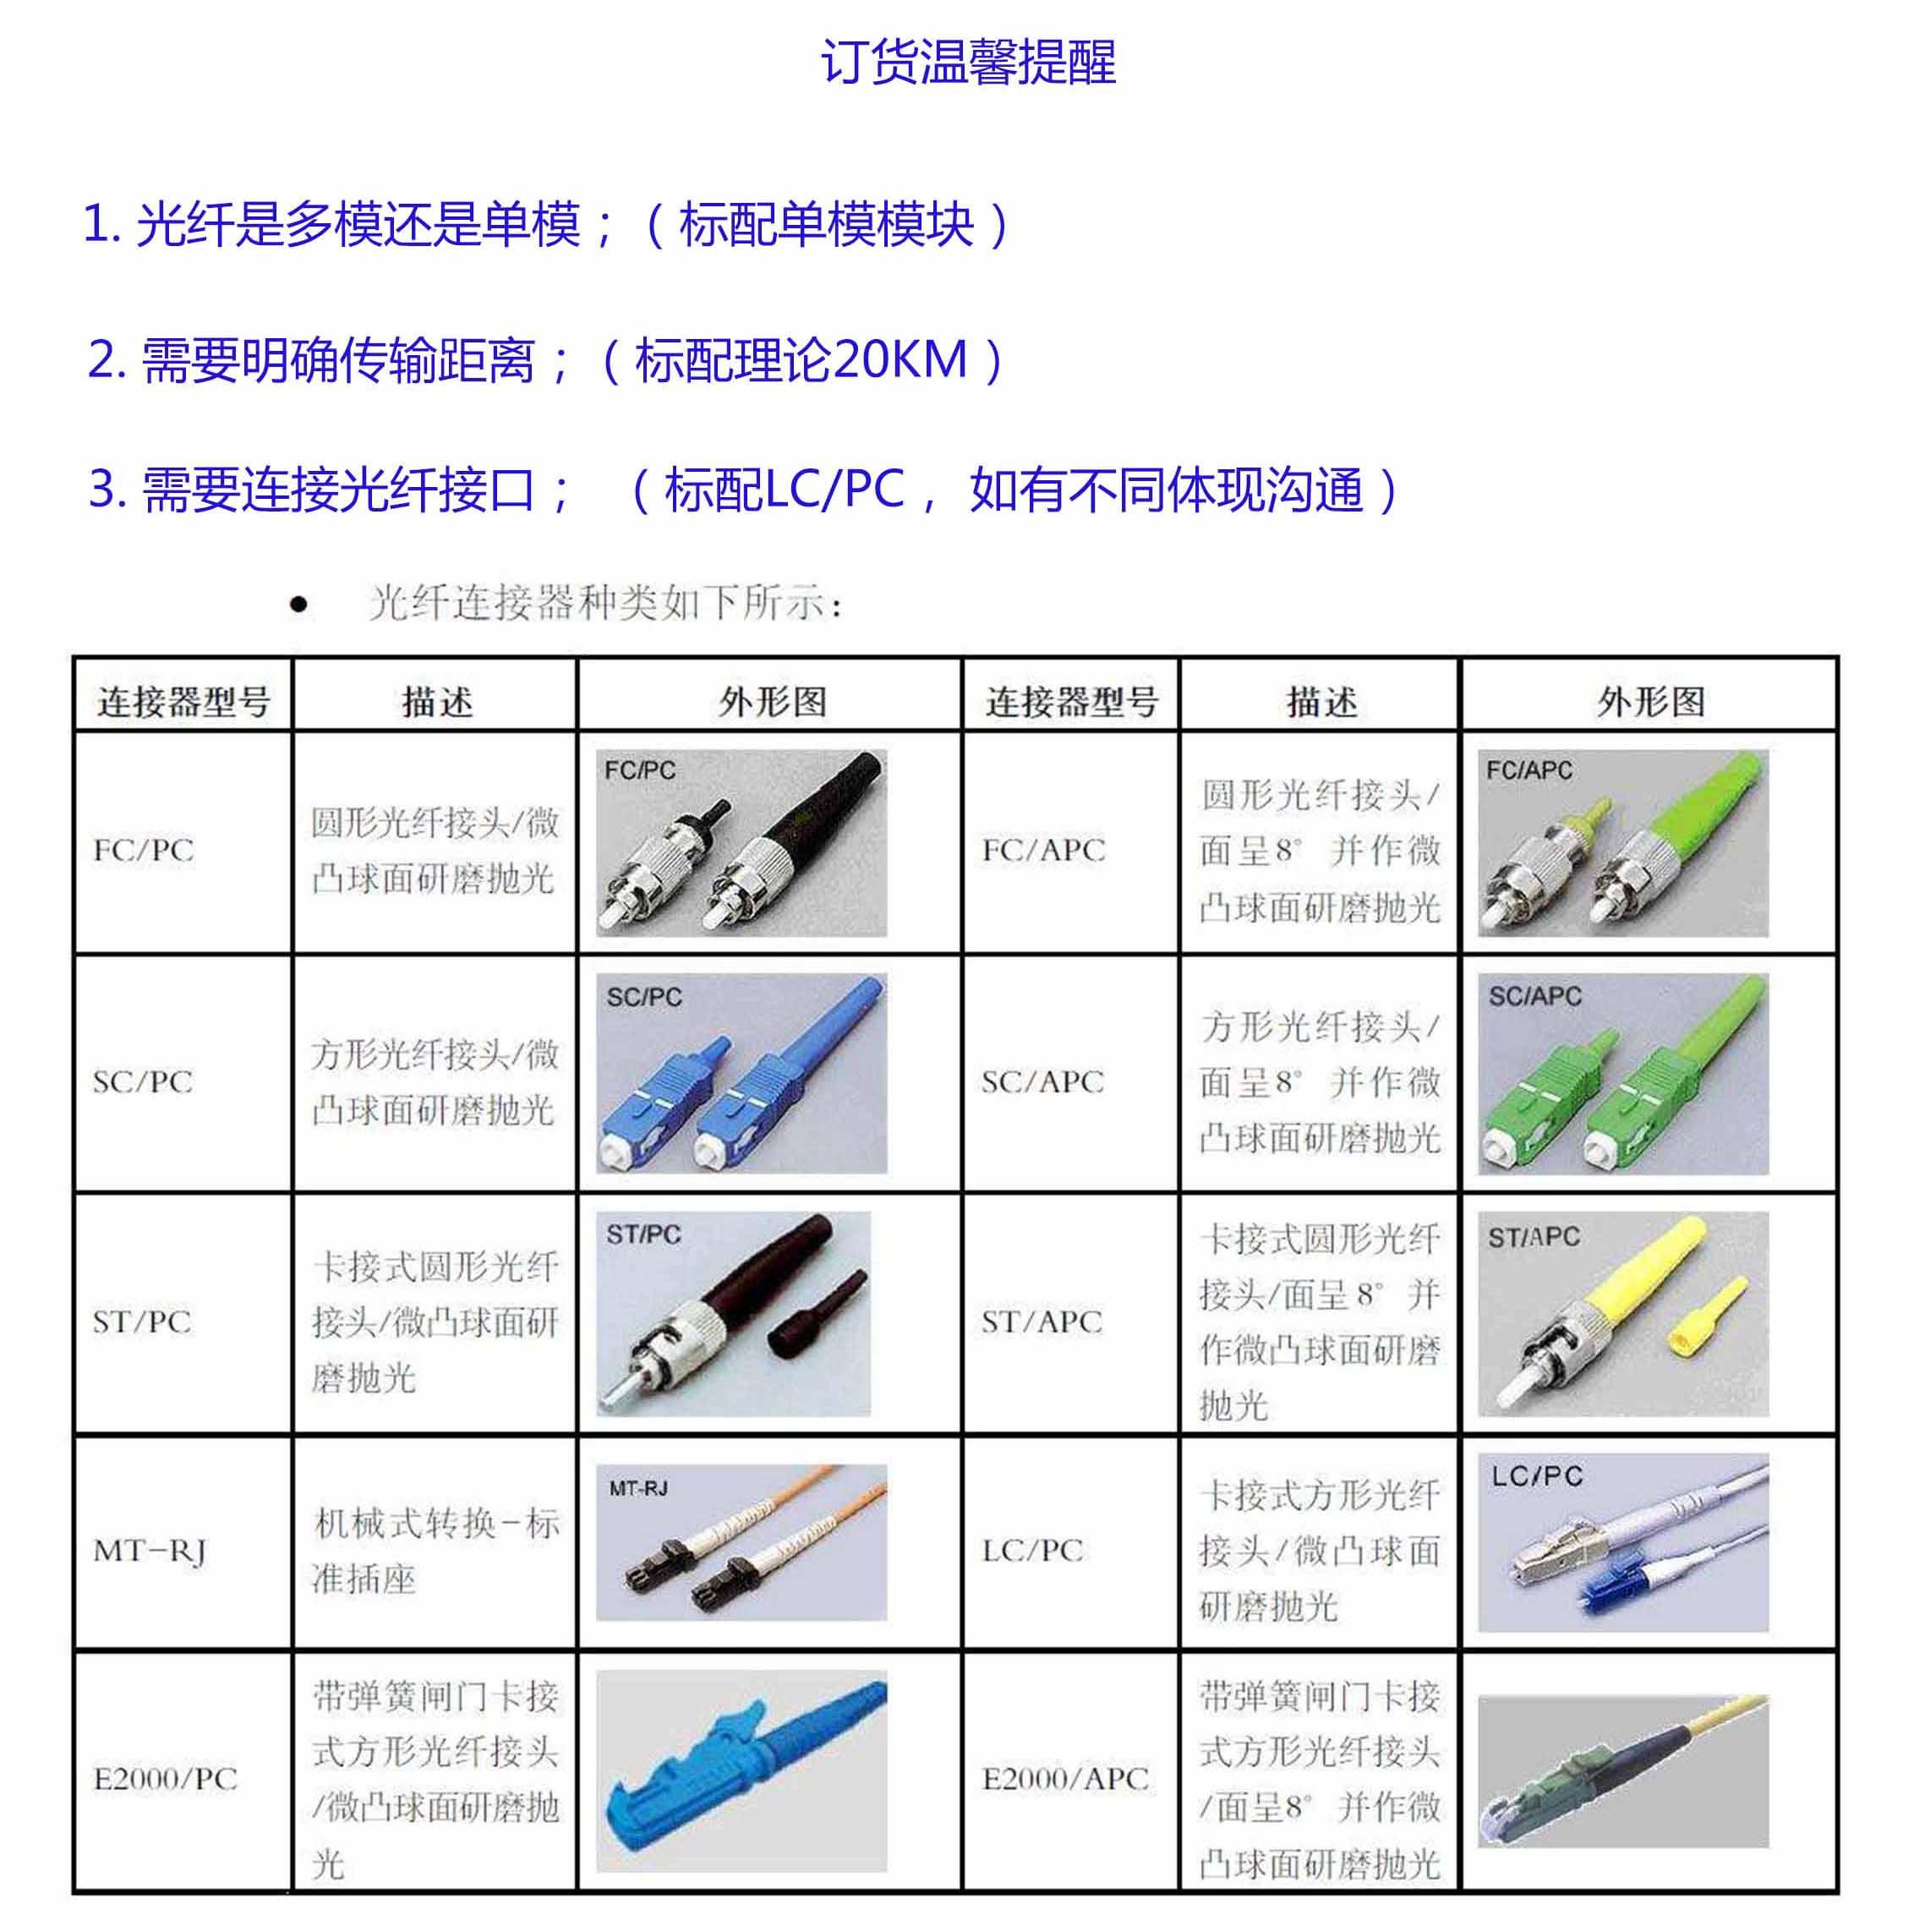 1*12G广播级光端机(便携式)